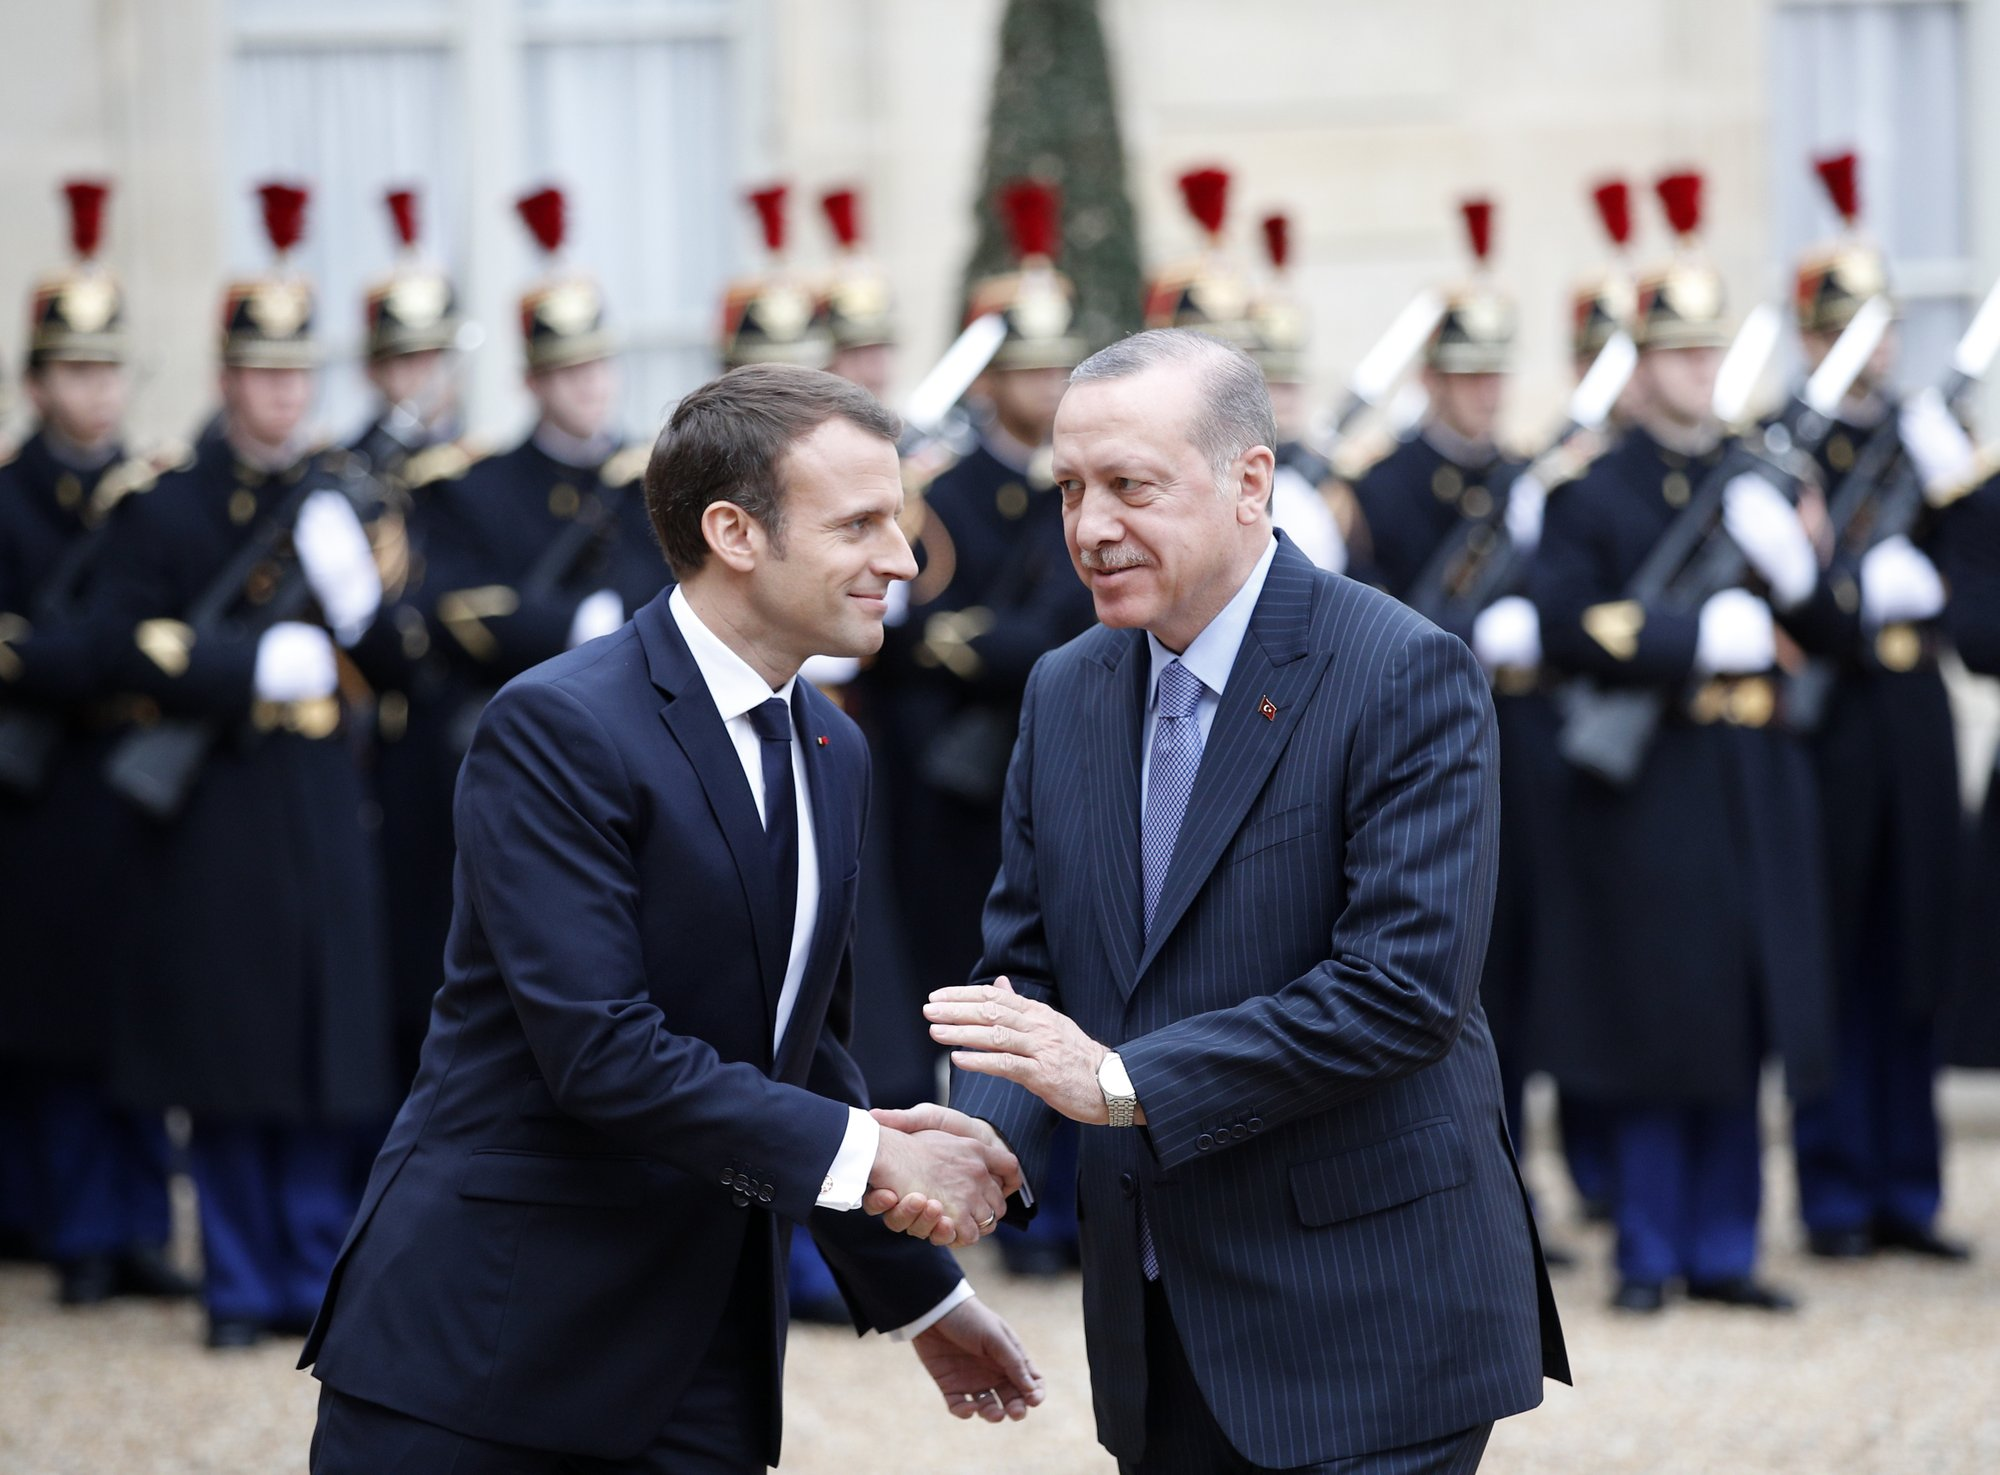 The Latest In Paris Erdogan Calls Turkey A State Of Law